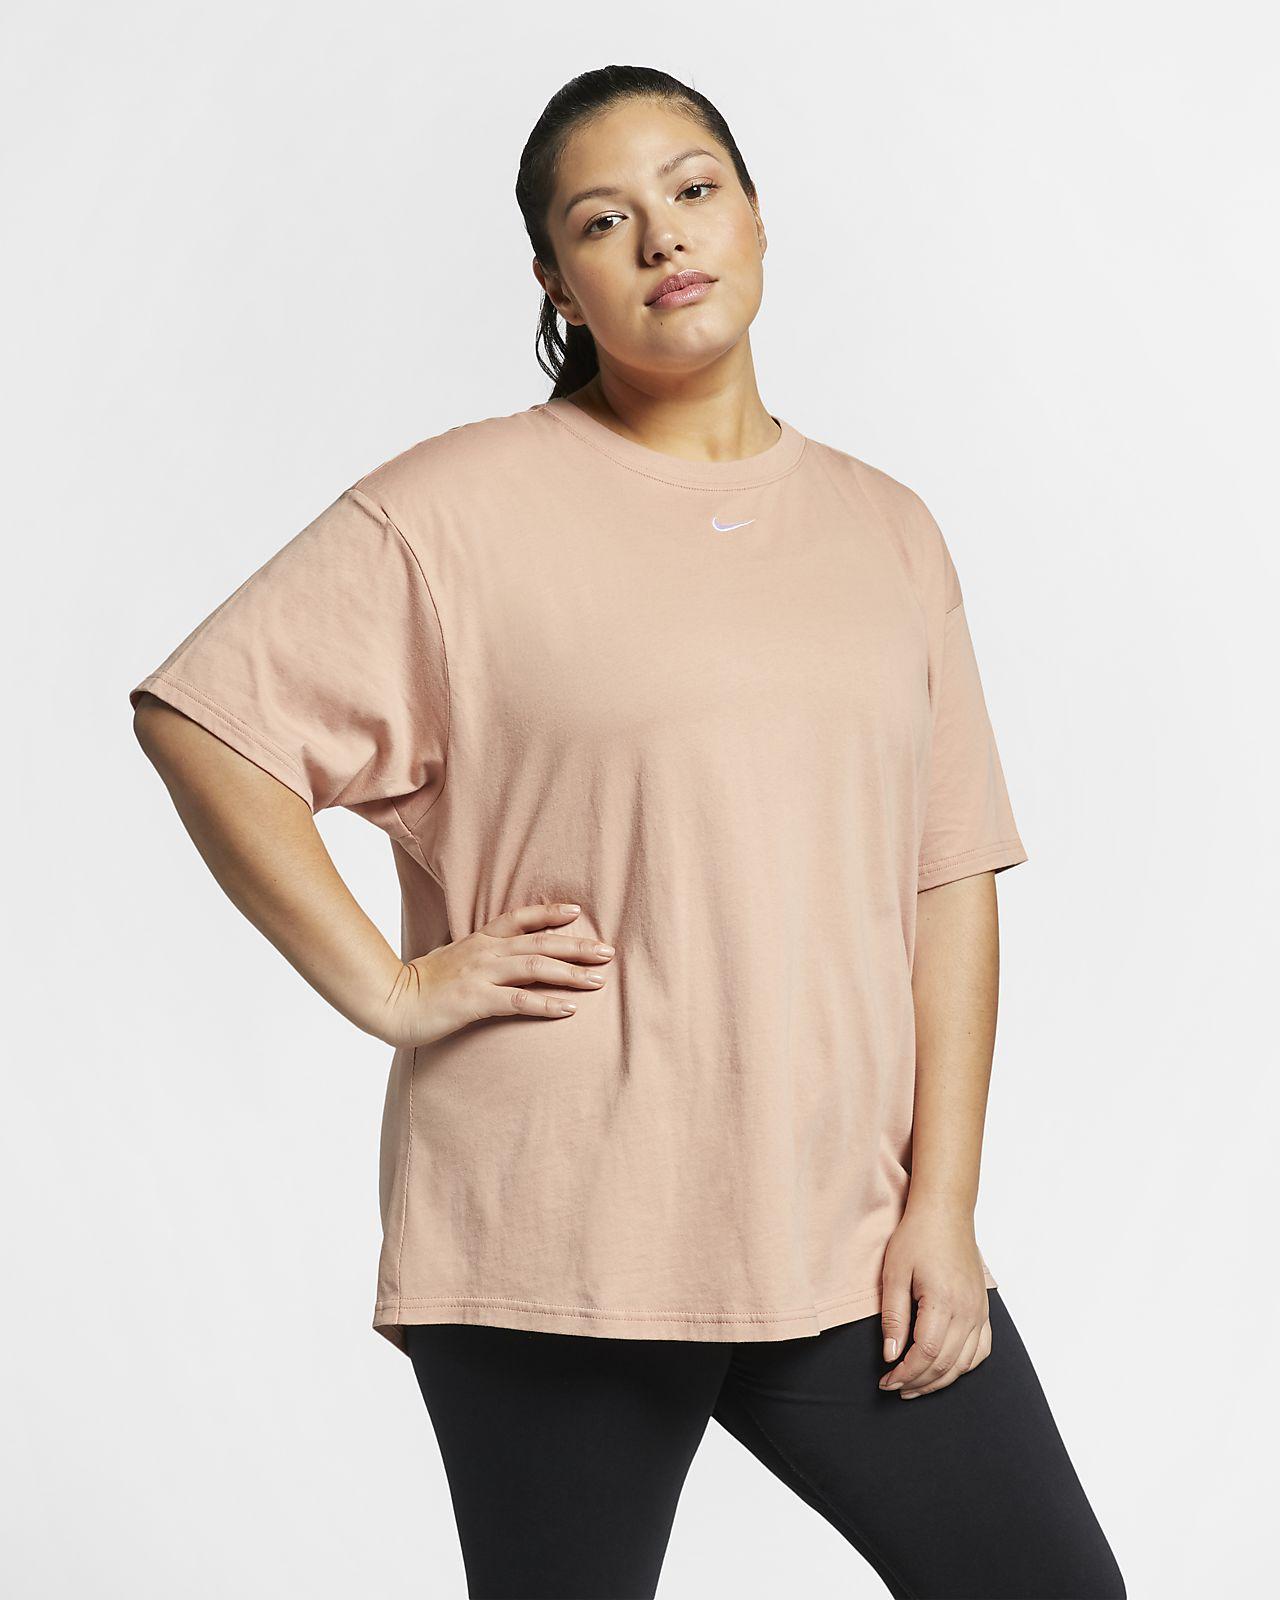 Nike Sportswear Essential Camiseta de manga corta (Talla grande) - Mujer